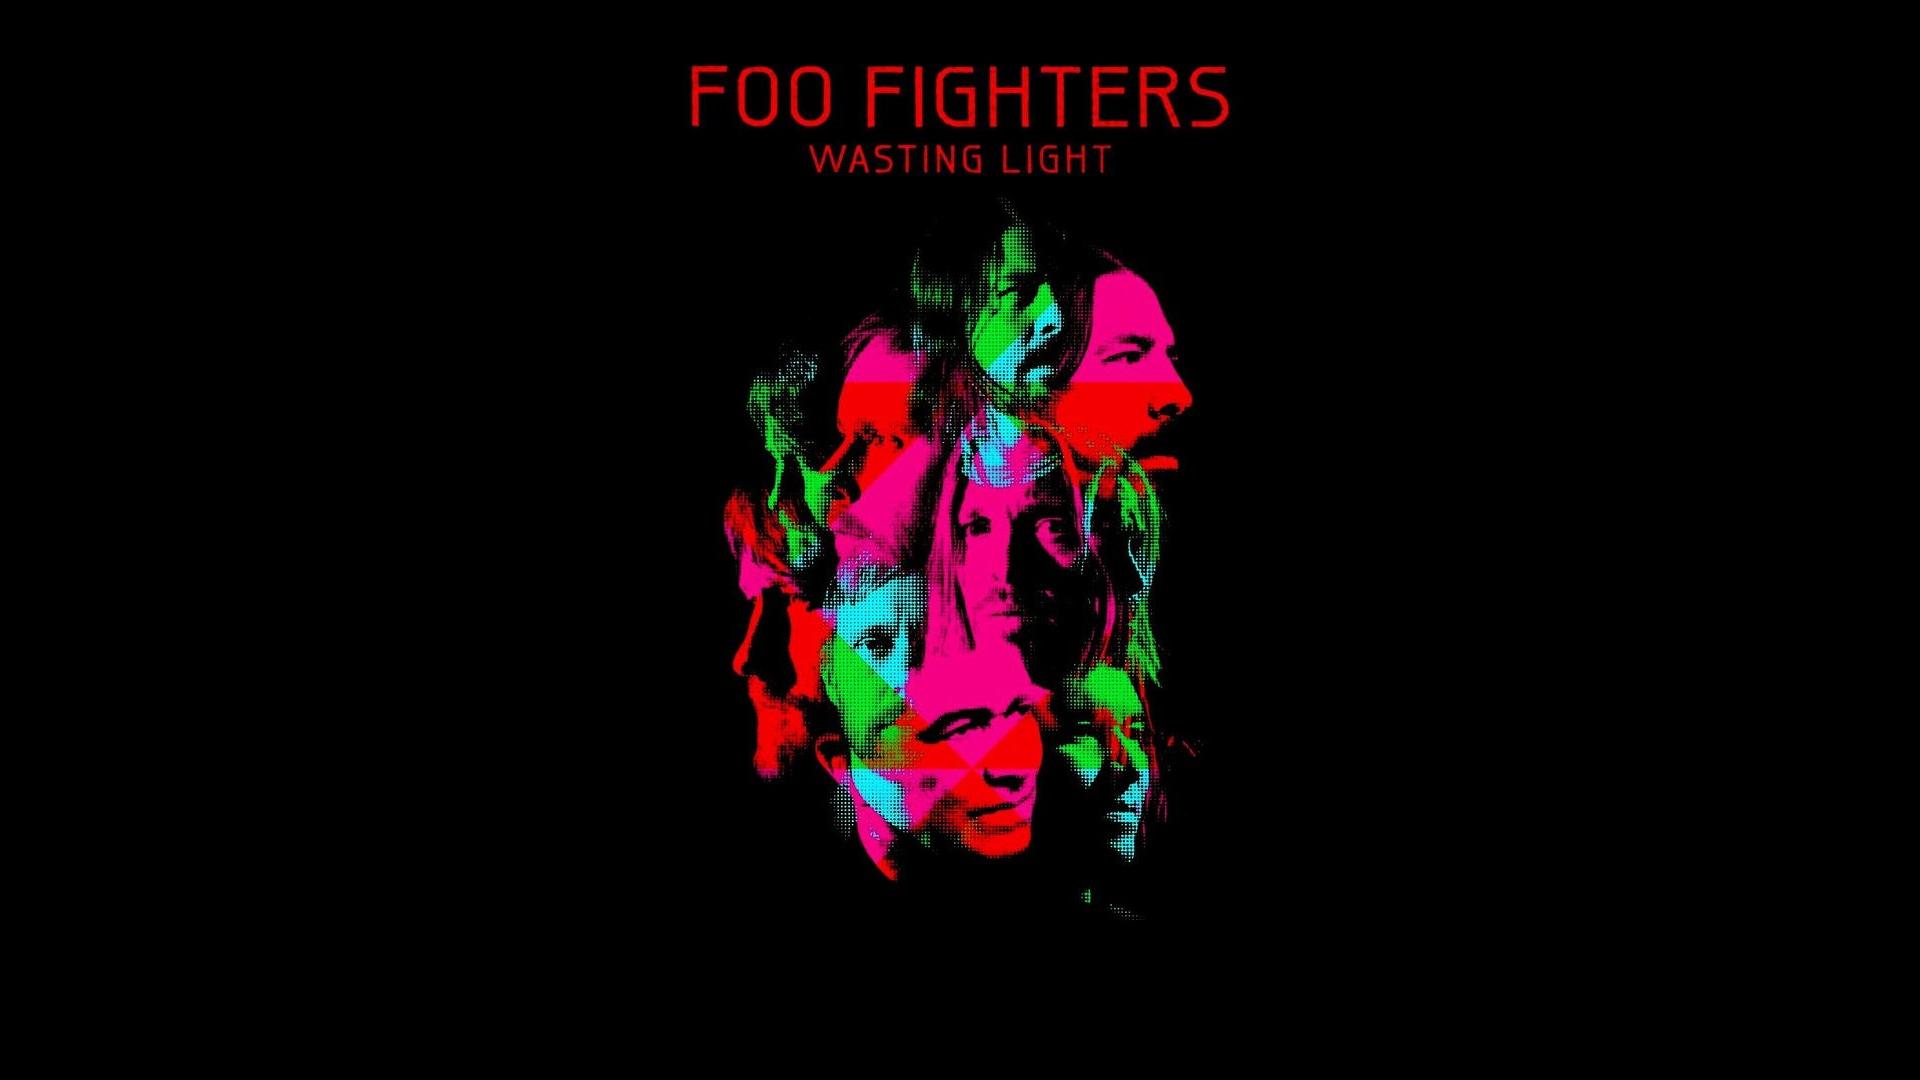 Foo Fighters Wasting Light Wallpaper By Orangeman80 On